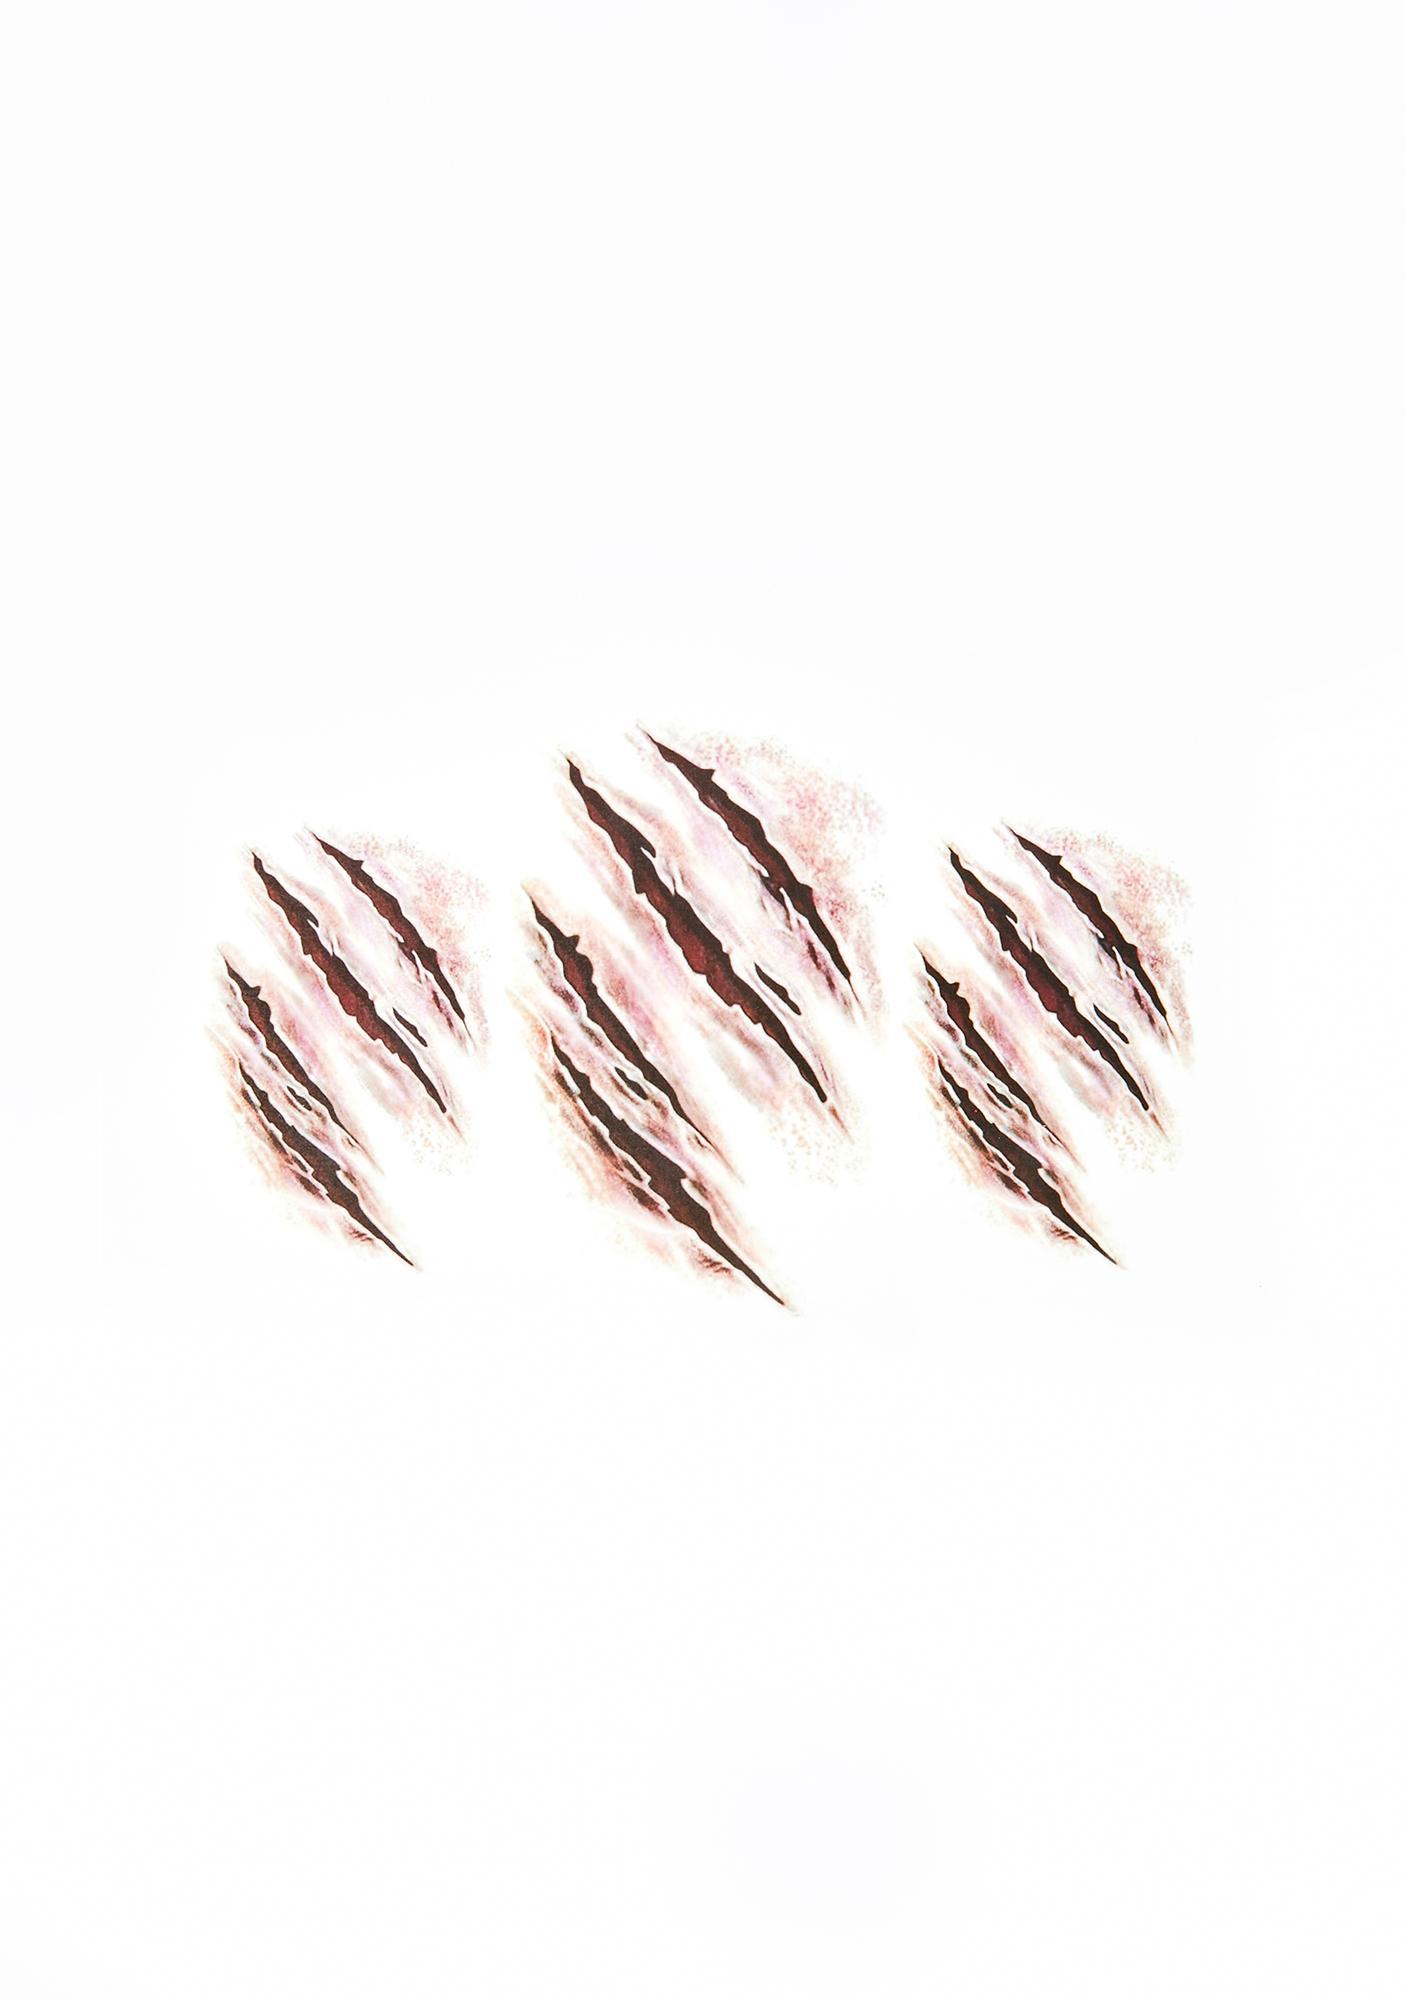 SHRINE Skin Rip Body Tattoos